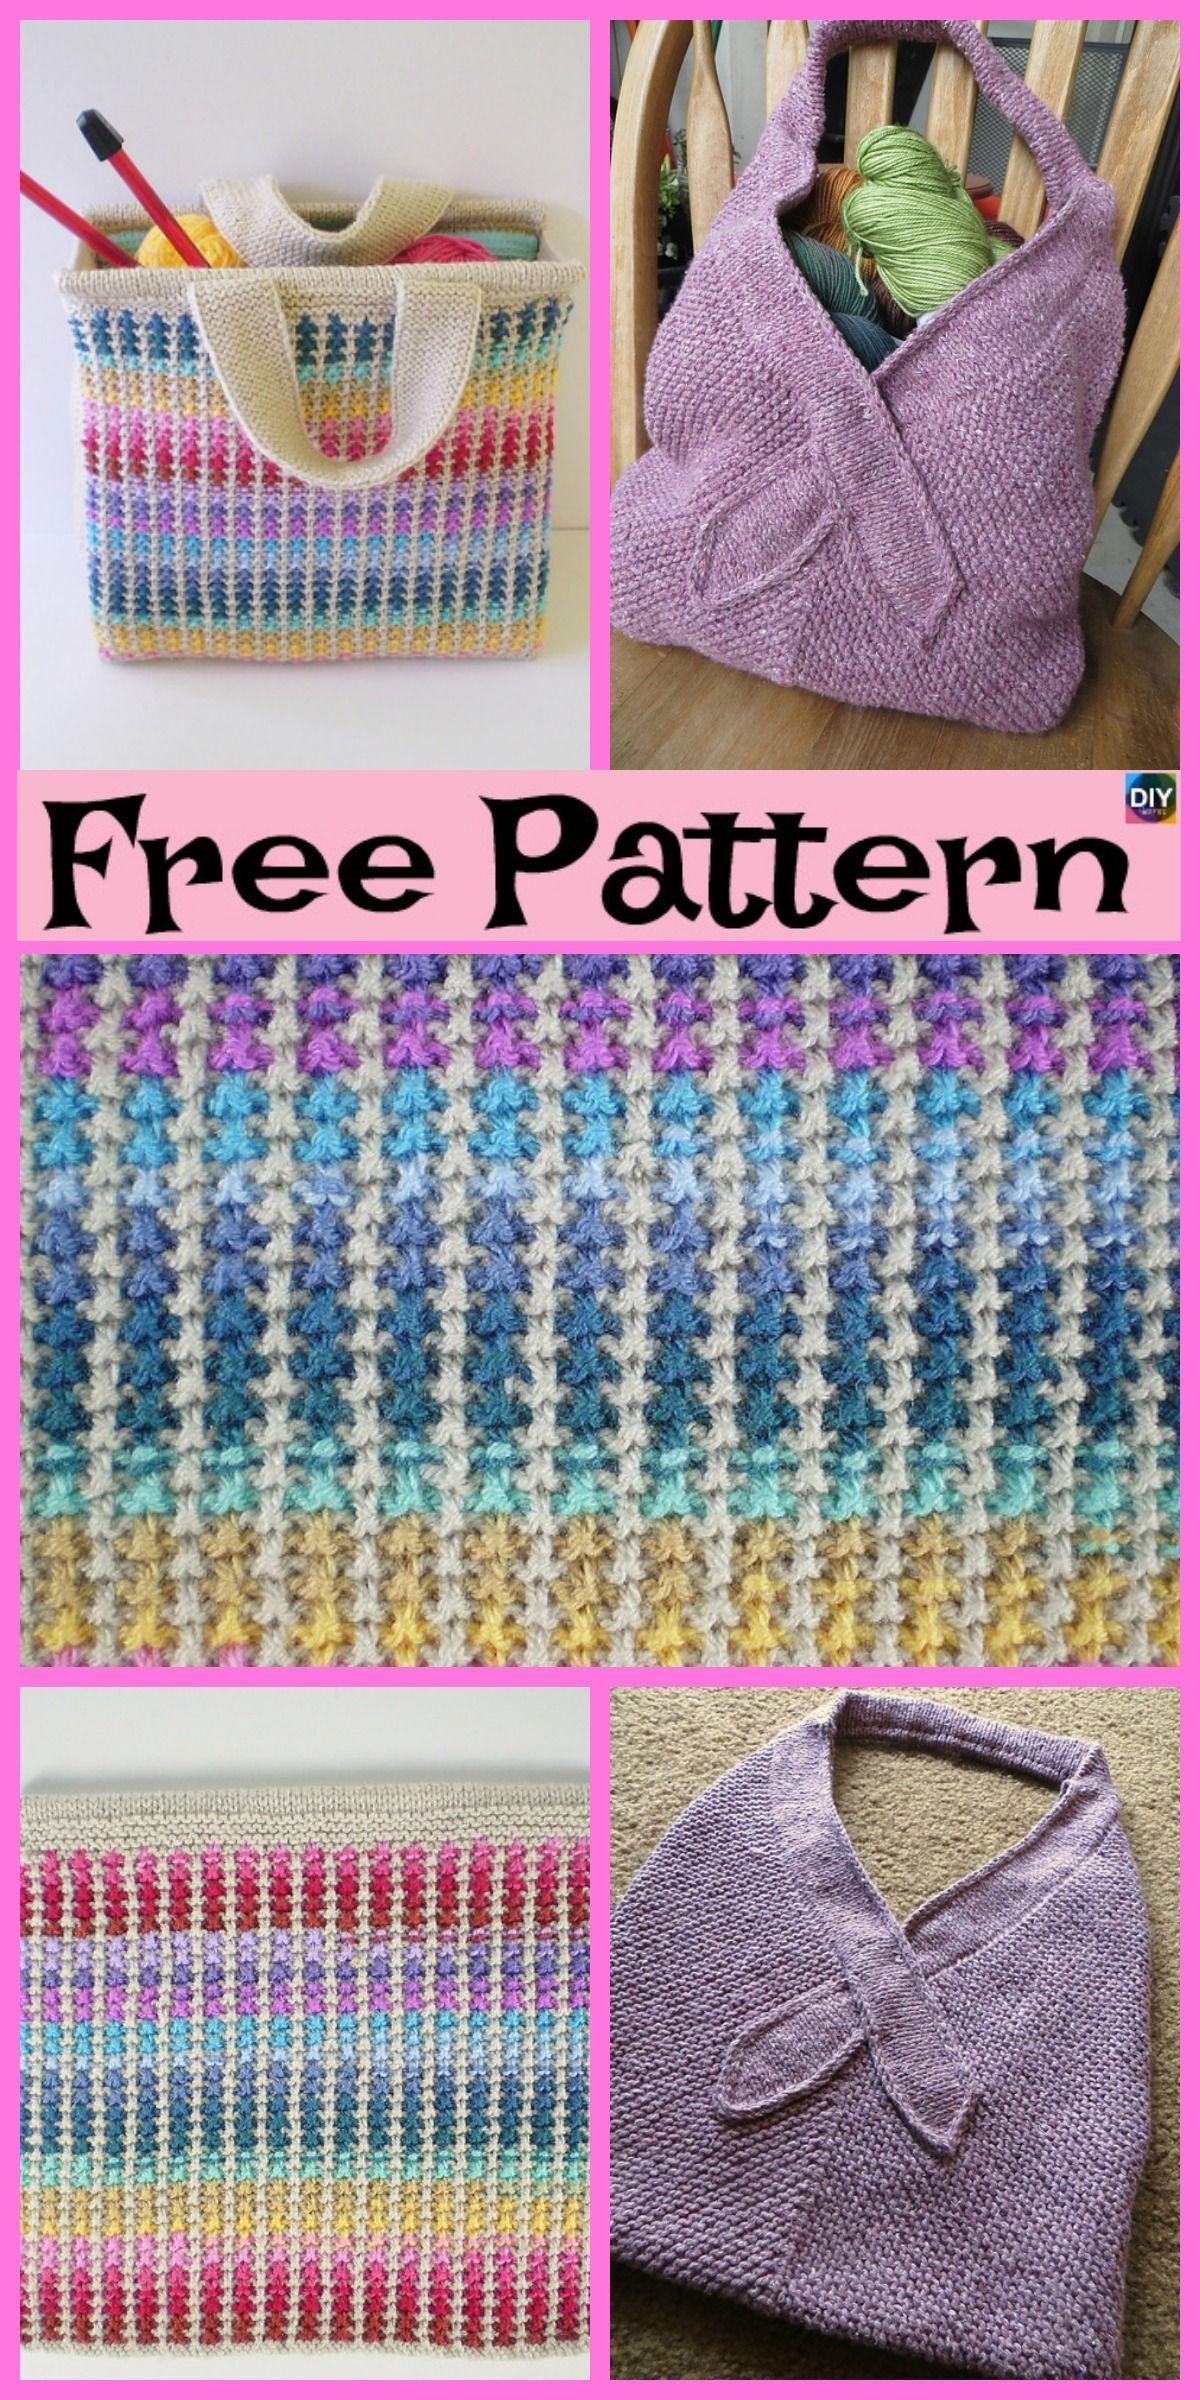 Beautiful Knit Tote Bag - Free Patterns in 2018 | Crochet & Knit ...